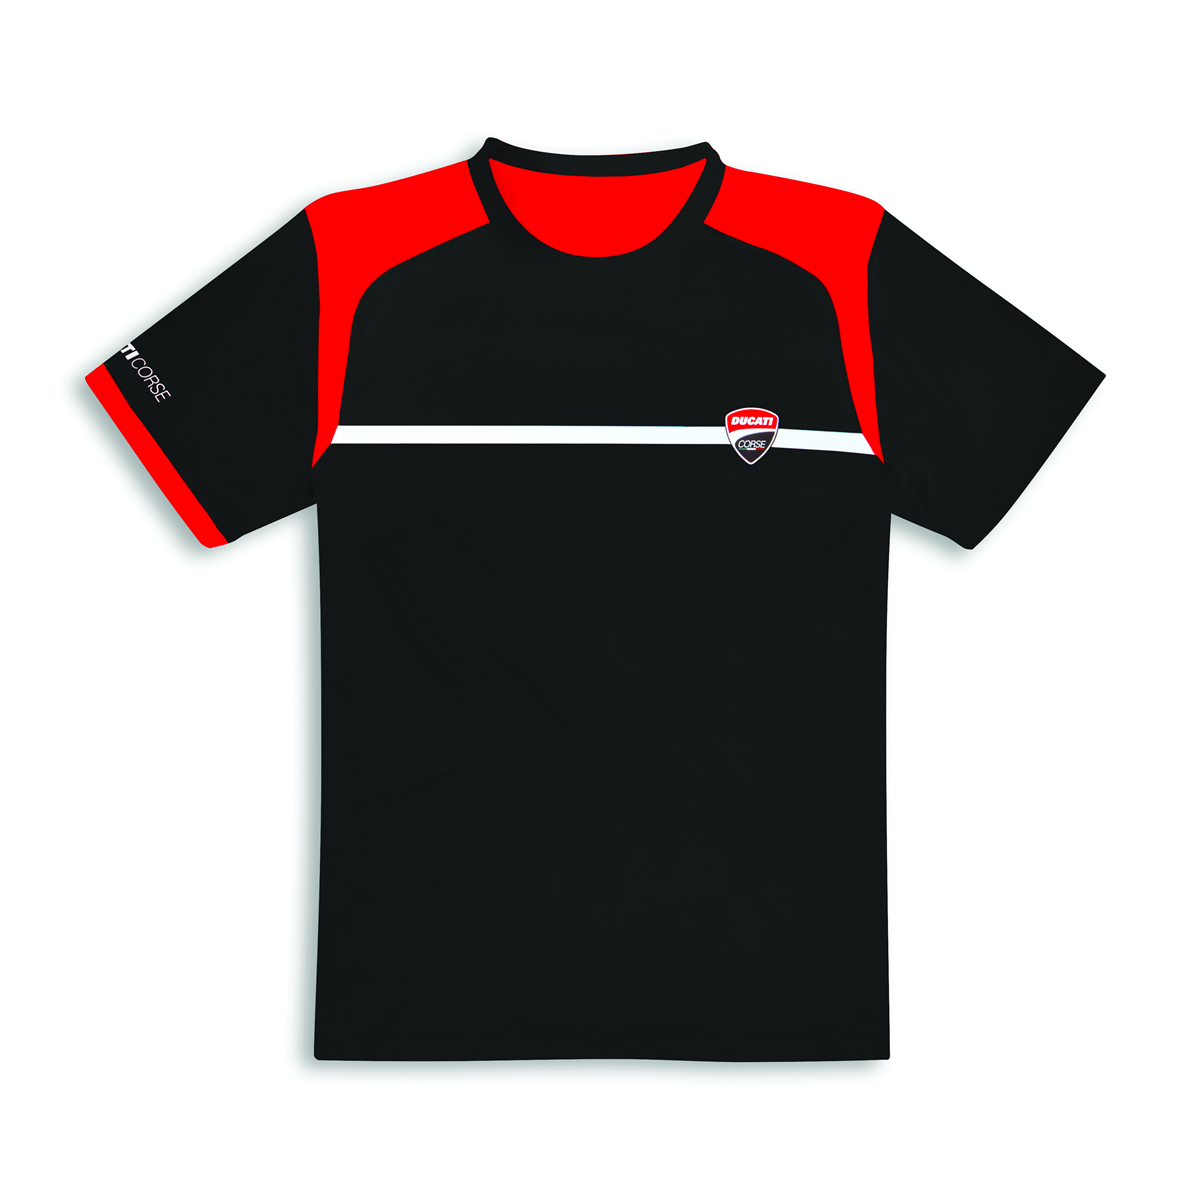 DUCATI CORSE POWER T- Shirt kurzarm Herren man shirt SCHWARZ  98769906  NEU 2019